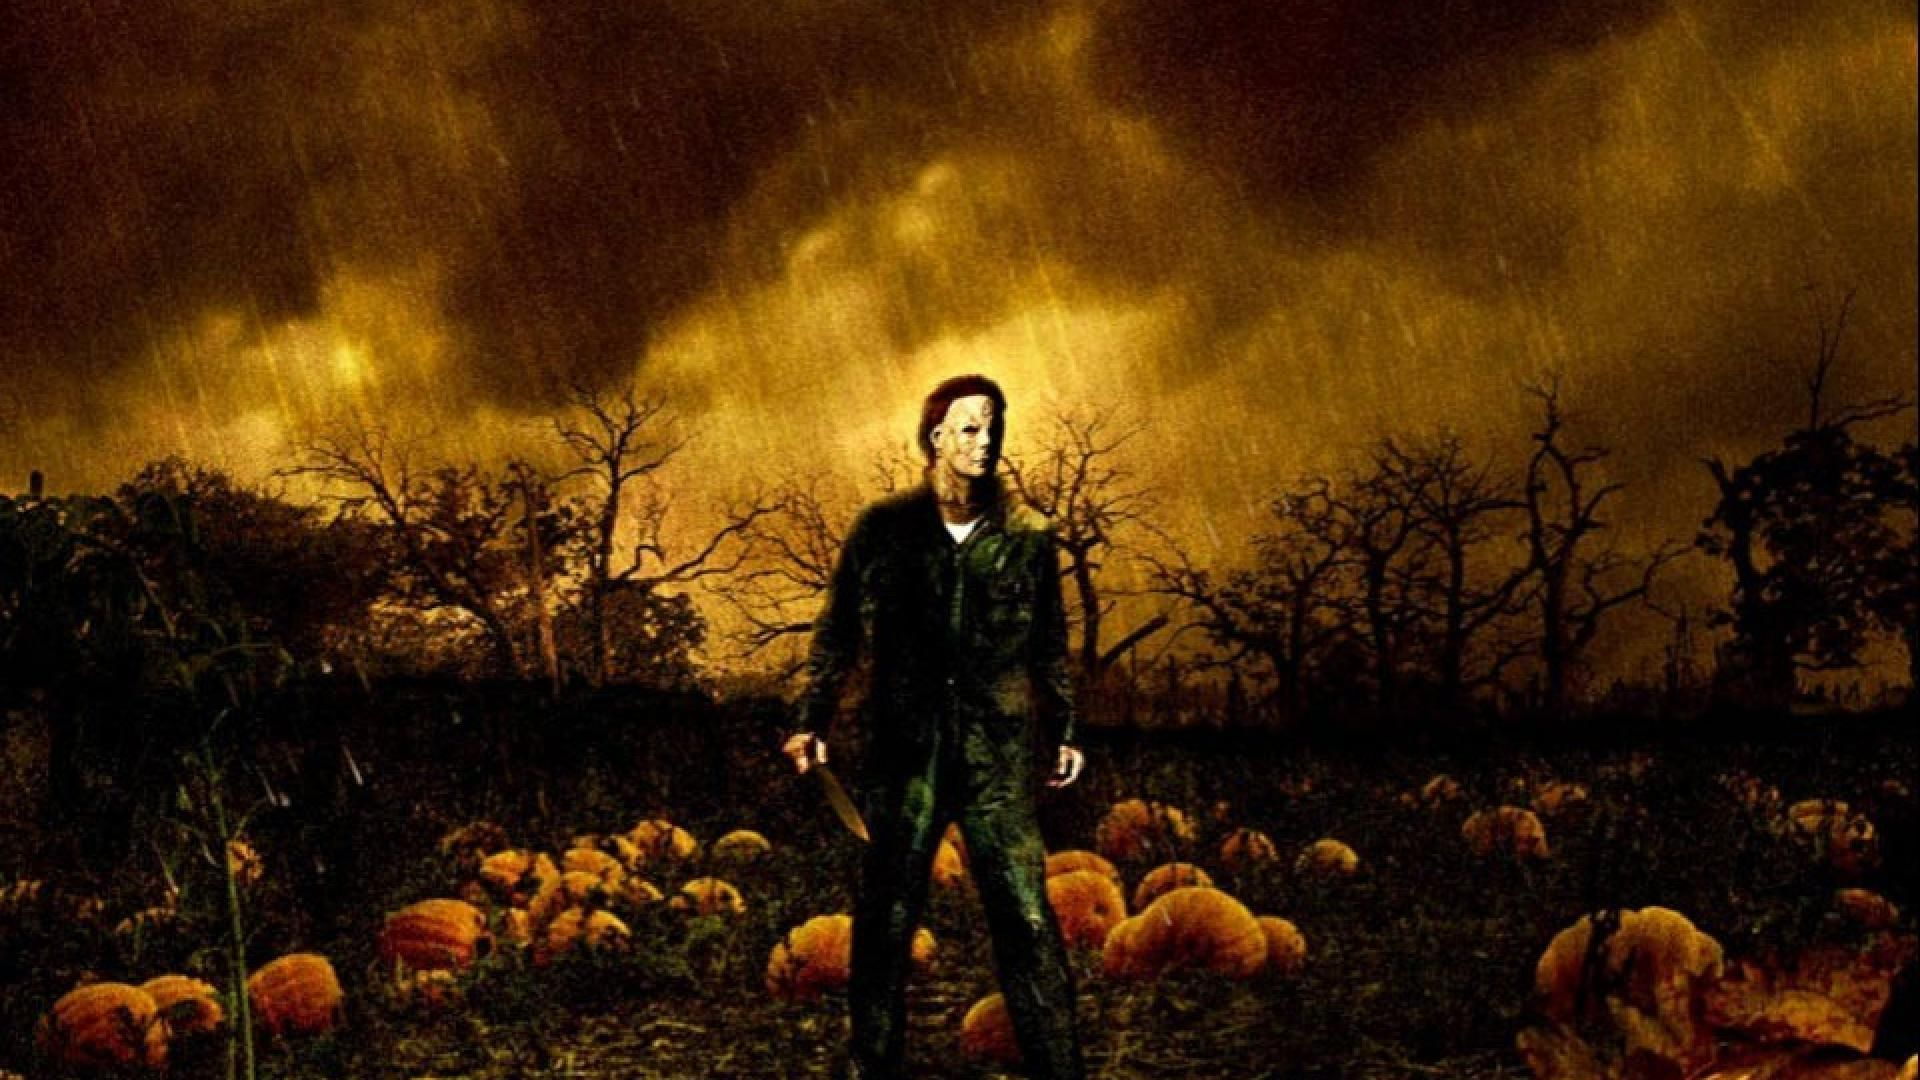 Pin by Ken Drake on Halloween Pinterest Michael myers